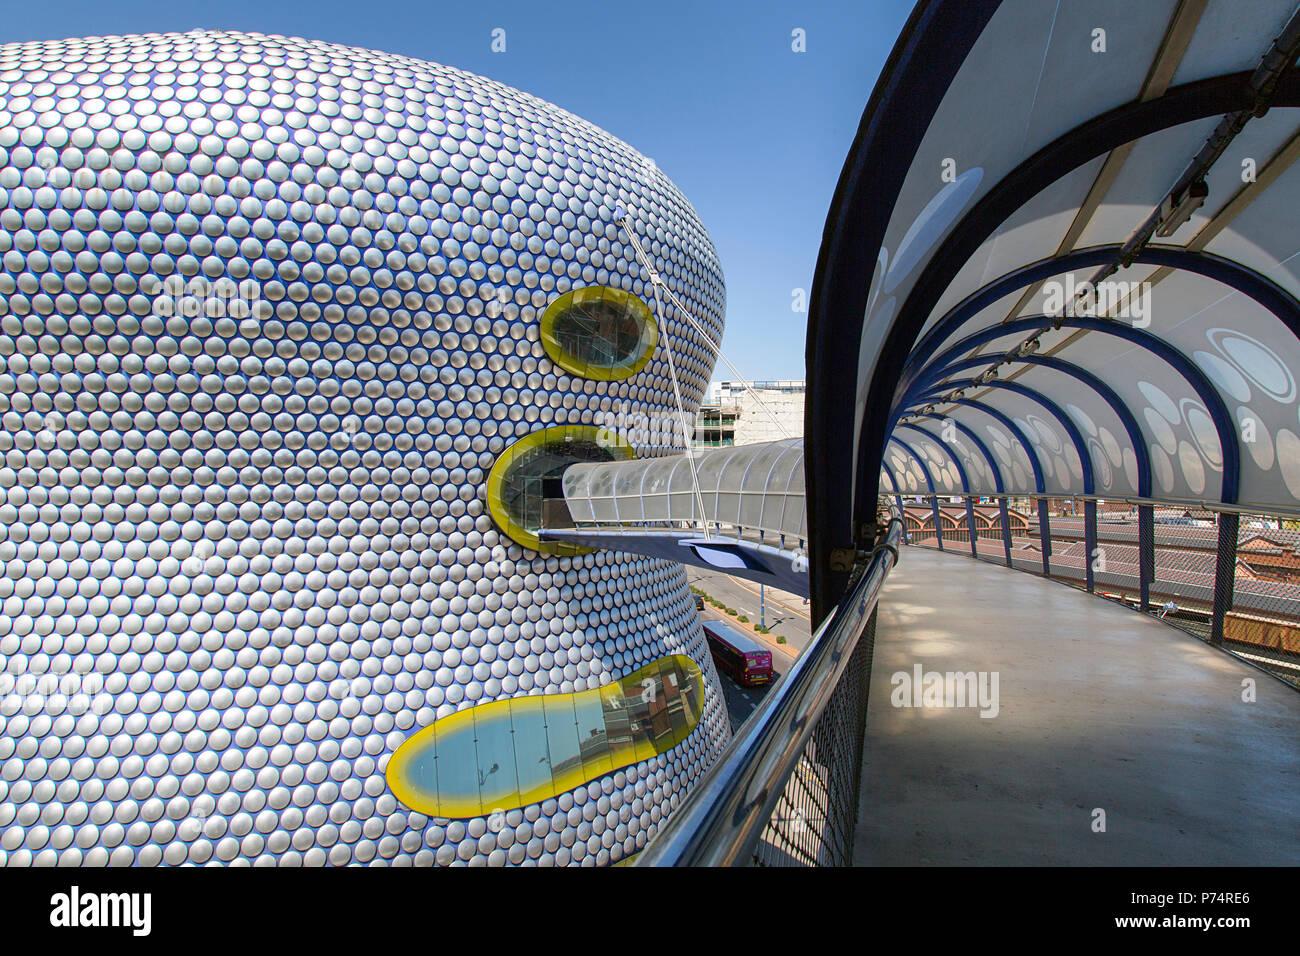 Birmingham, UK: June 29, 2018: Selfridges Department Store in Park Street, part of the Bullring Shopping Centre - from the multi-storey car park. Stock Photo